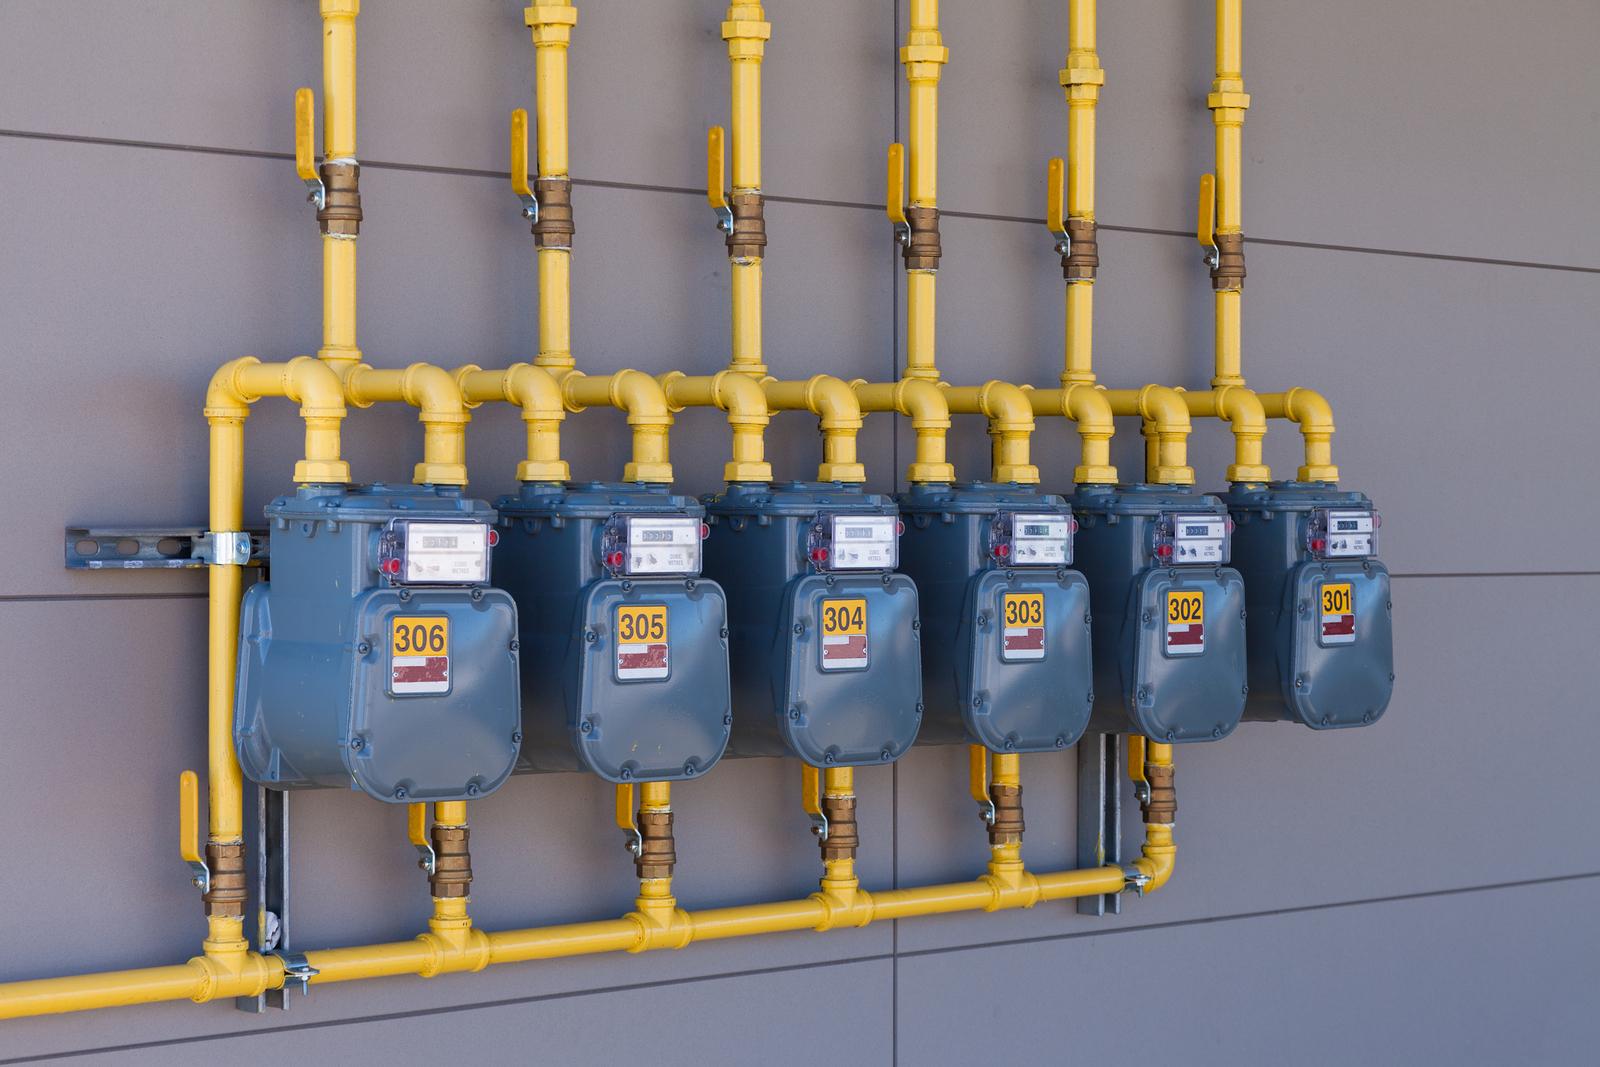 Rike Plumbing - Gas Fitter - Calgary Alberta